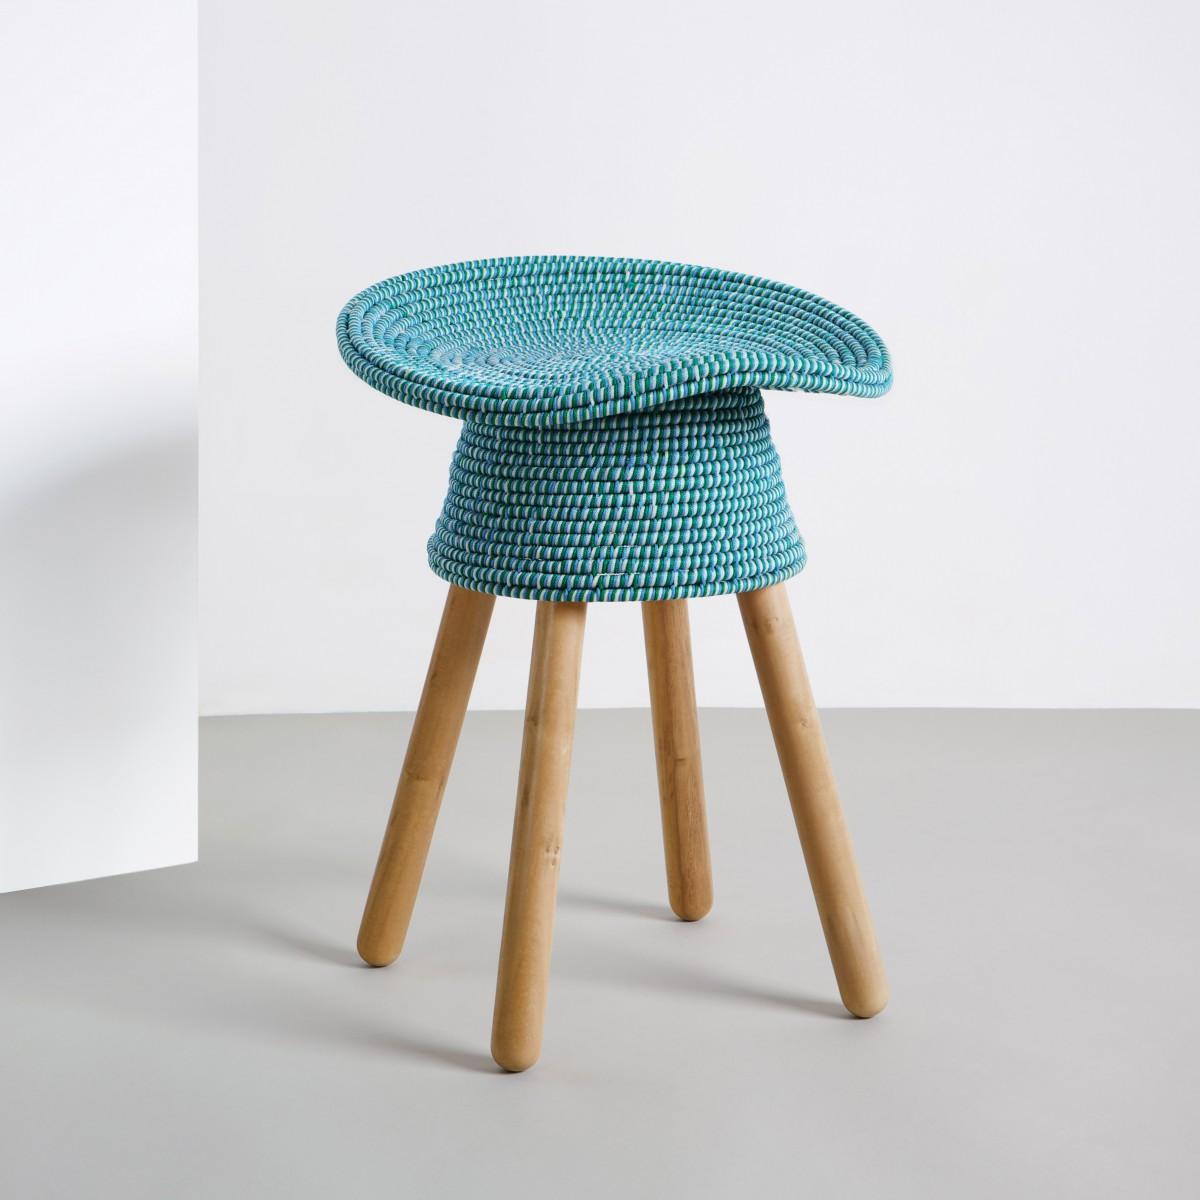 880240-020-coiled_stool-001_3.jpg